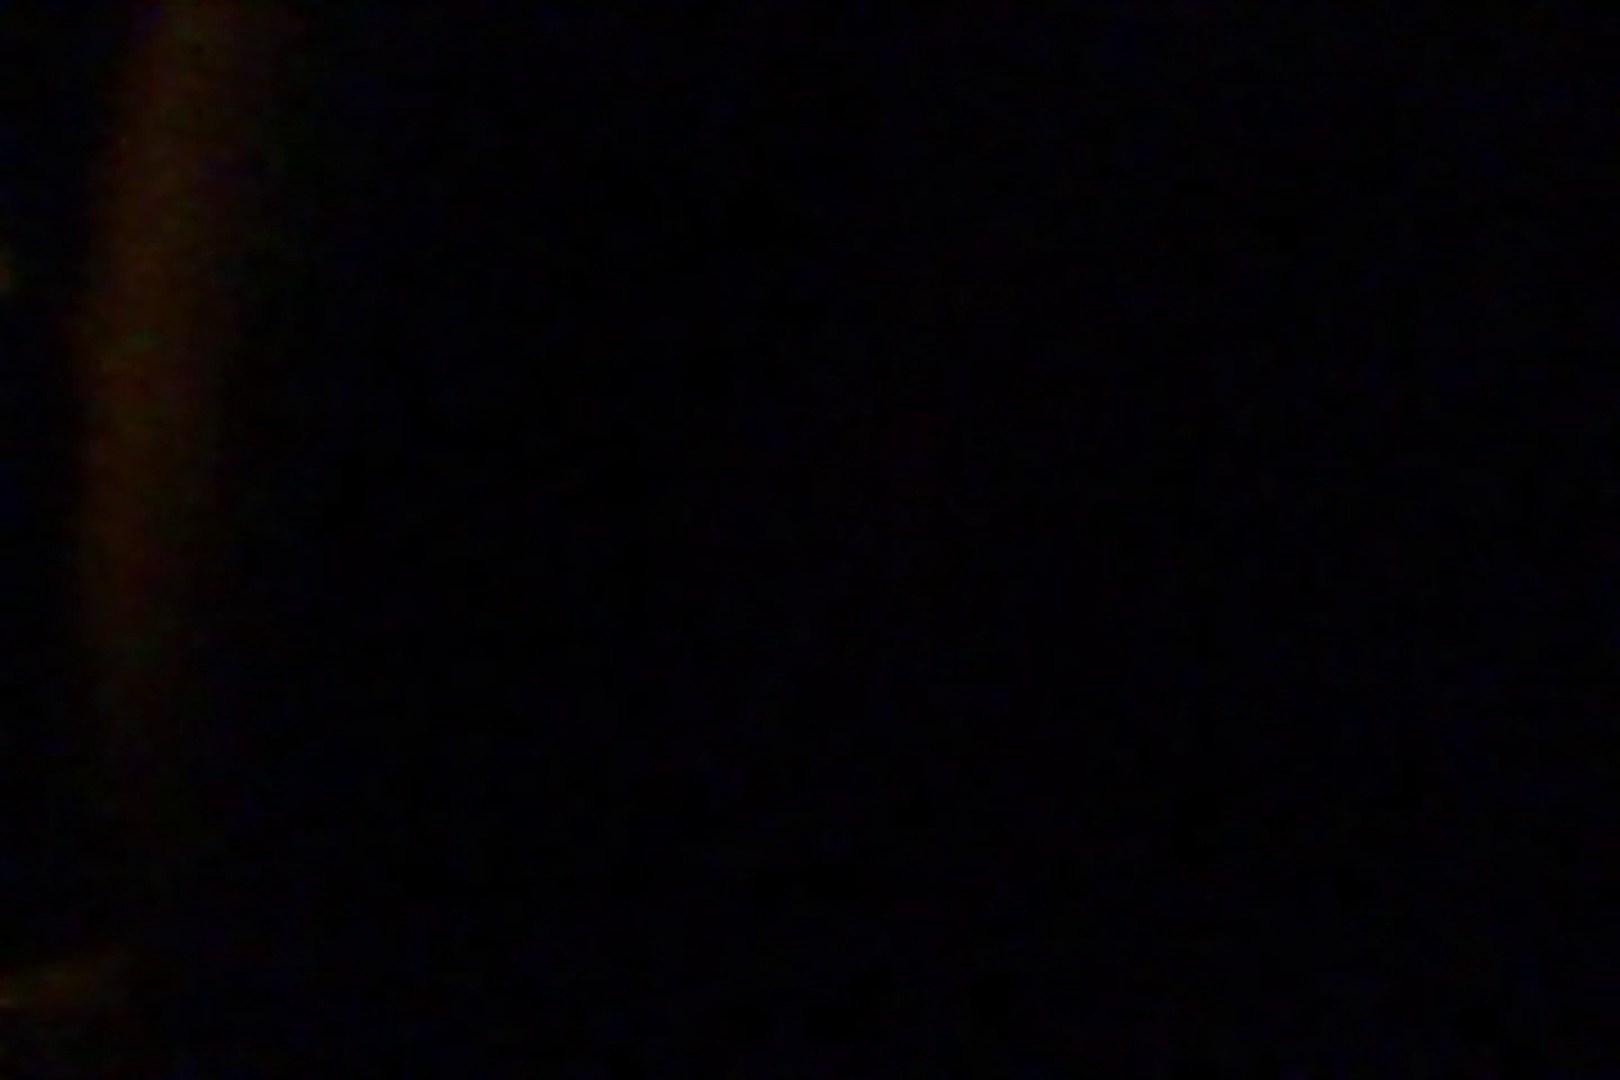 Gボーイ初投稿!掴み取りさんの洗面所覗き!in新幹線!VOL.18 おやじ熊系な男たち ちんぽ画像 106連発 22